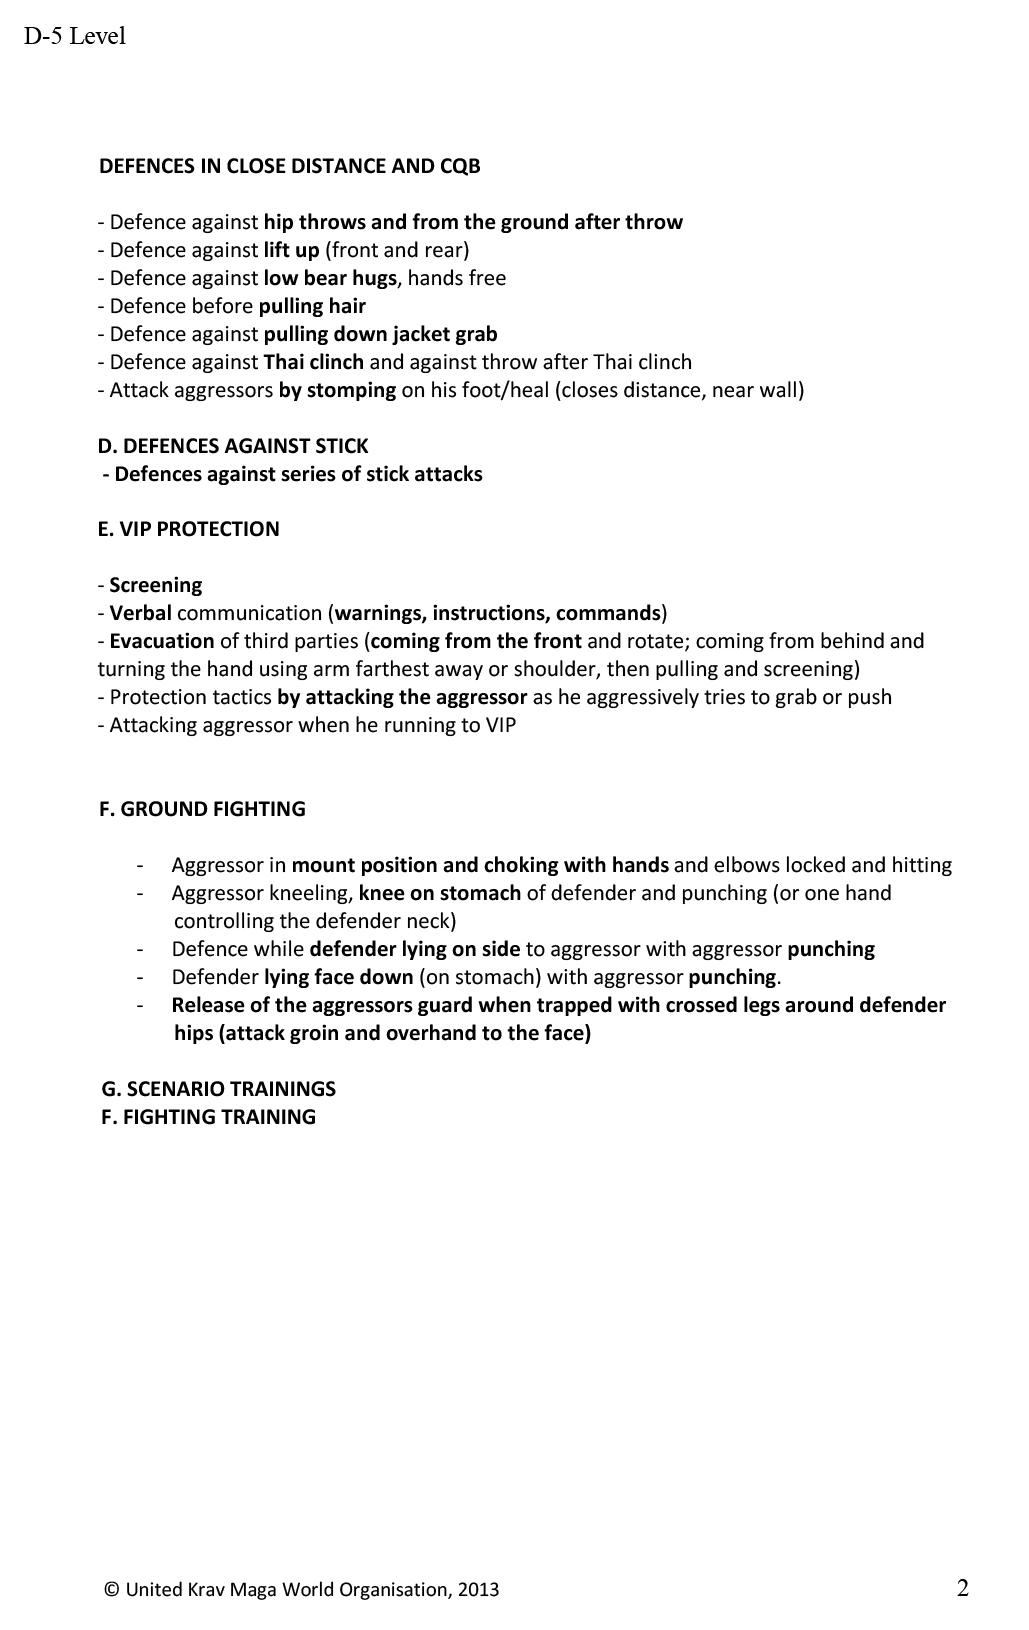 D5_ENGLISH.pdf-2.jpg